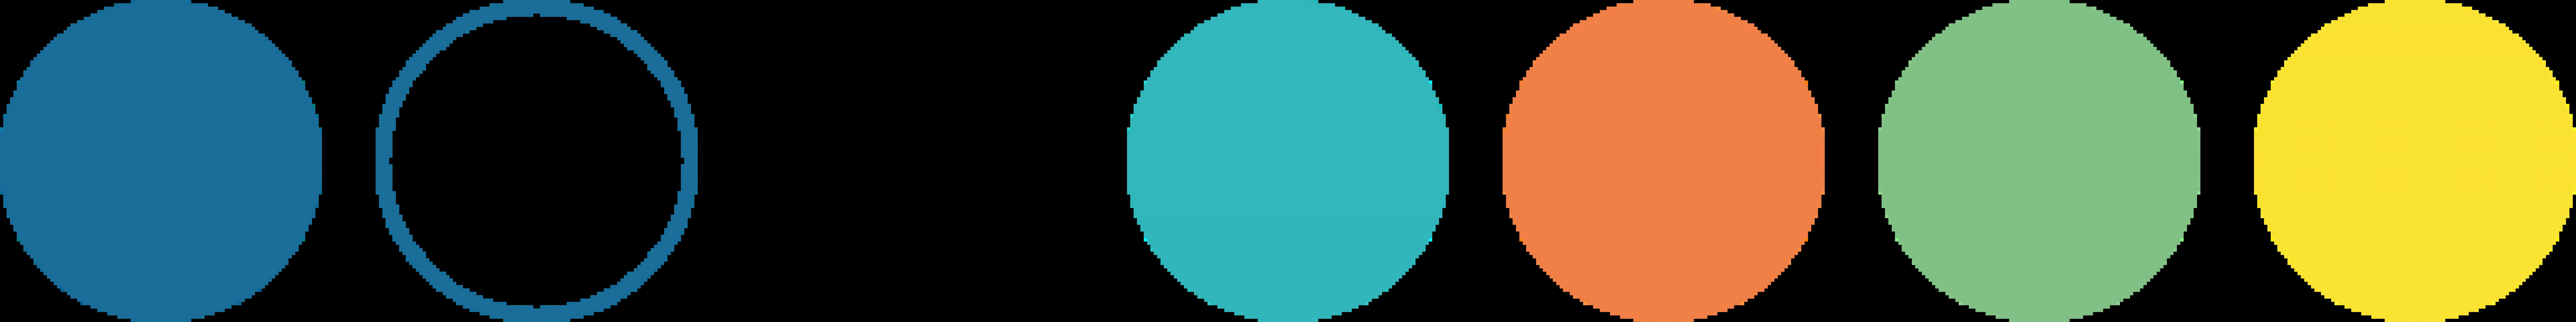 Snom-Rebranding-Farben